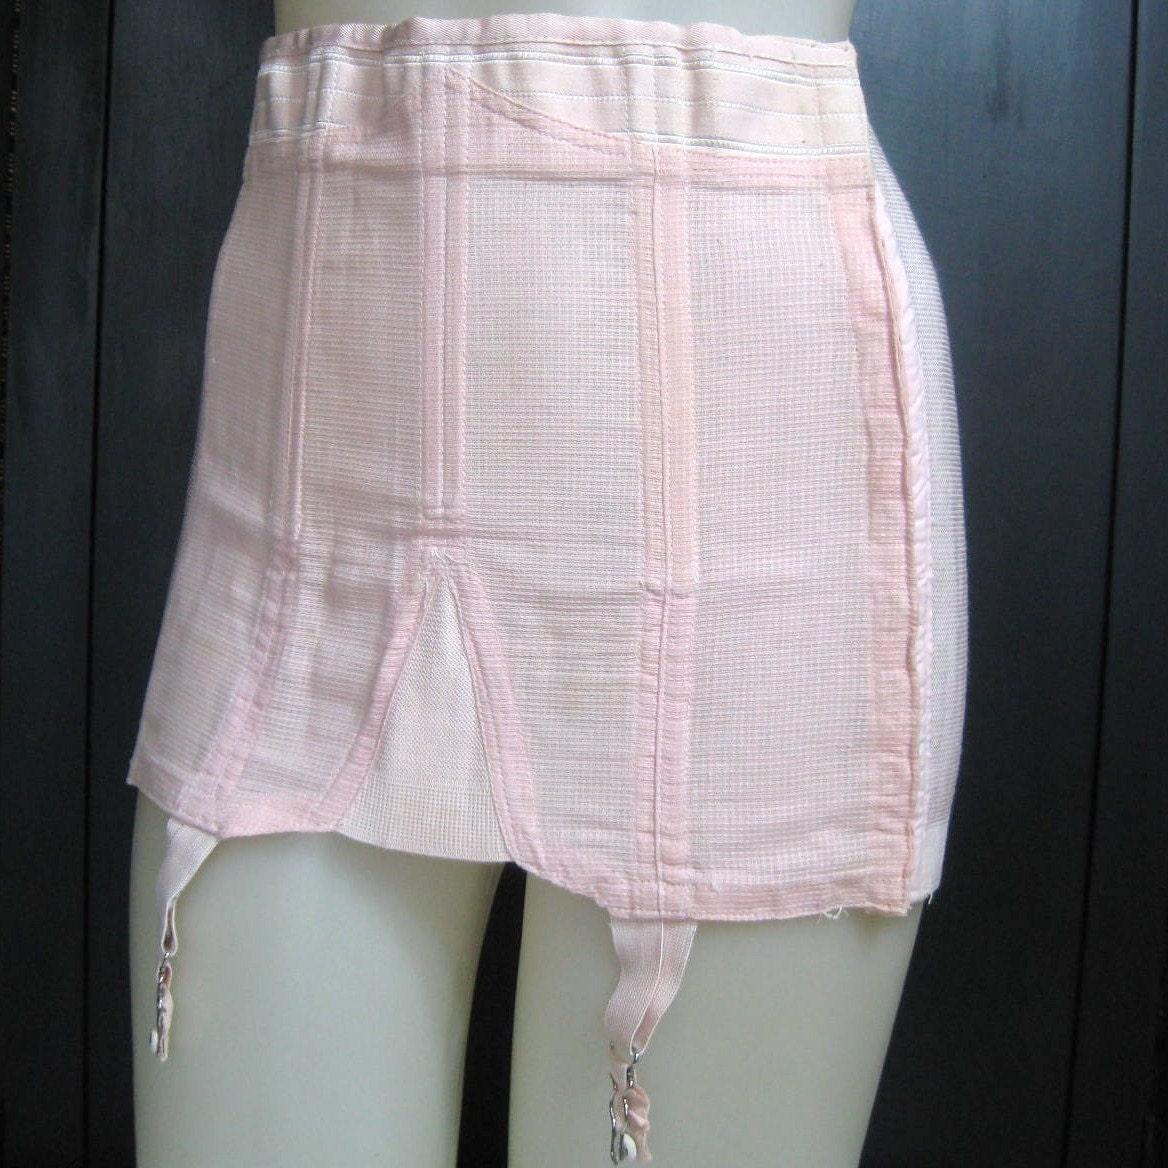 Vtg 30s 40s Pink Boned Stocking Garter Girdle Rengo Crown